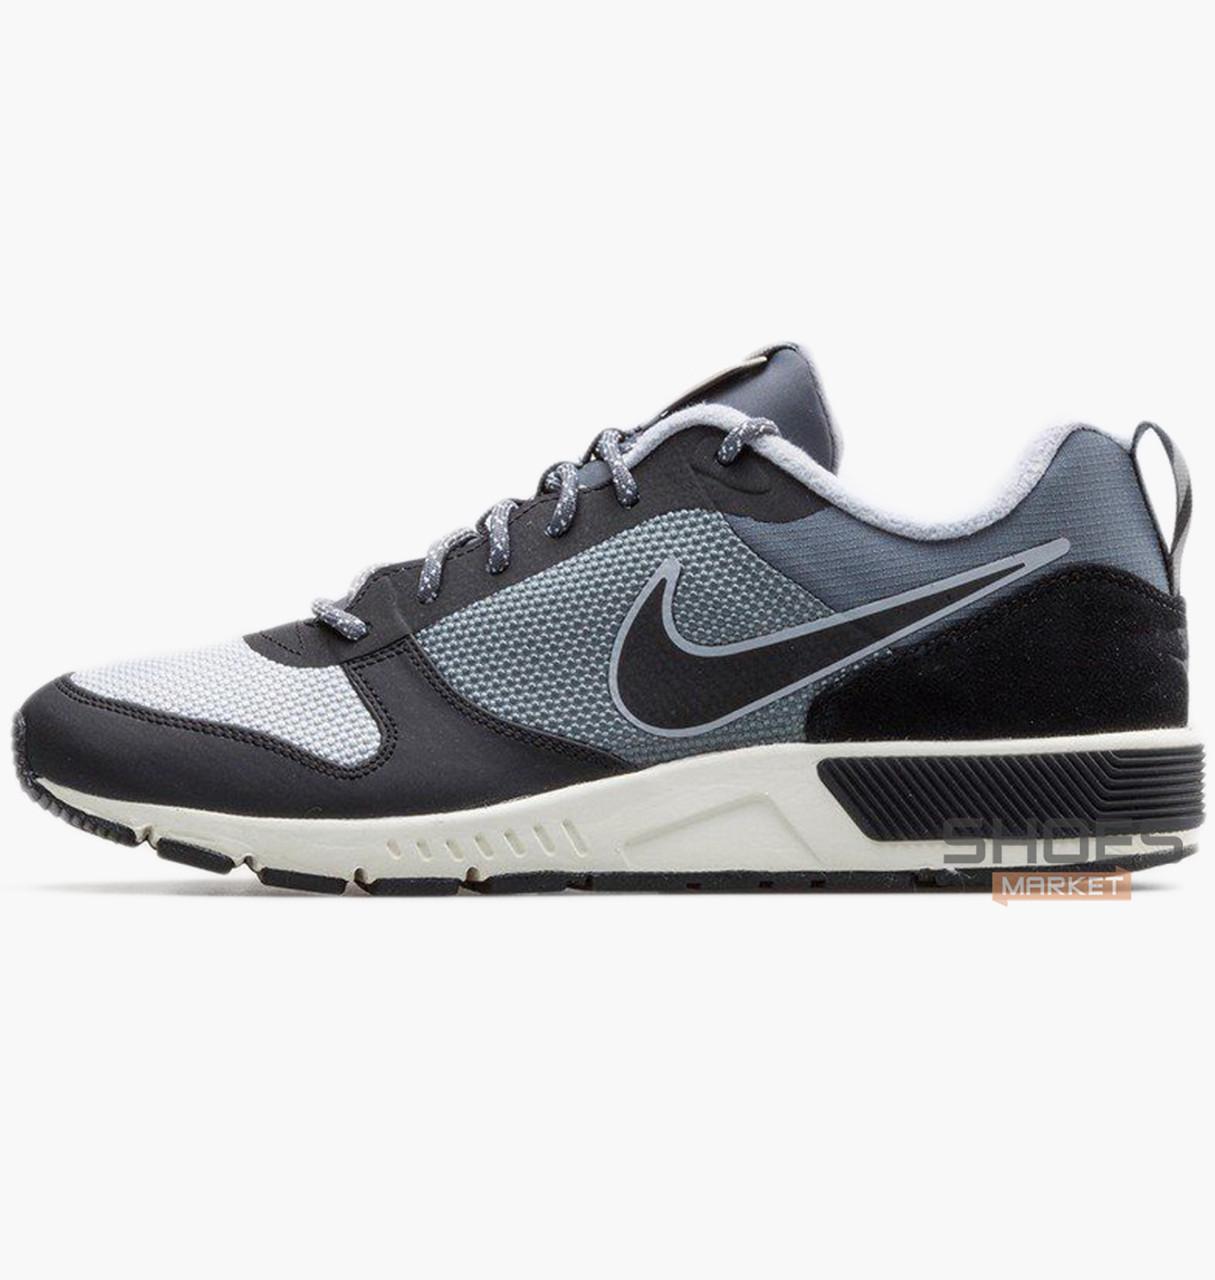 Мужские Кроссовки Nike Nightgazer Black/Blue 916775-003, оригинал